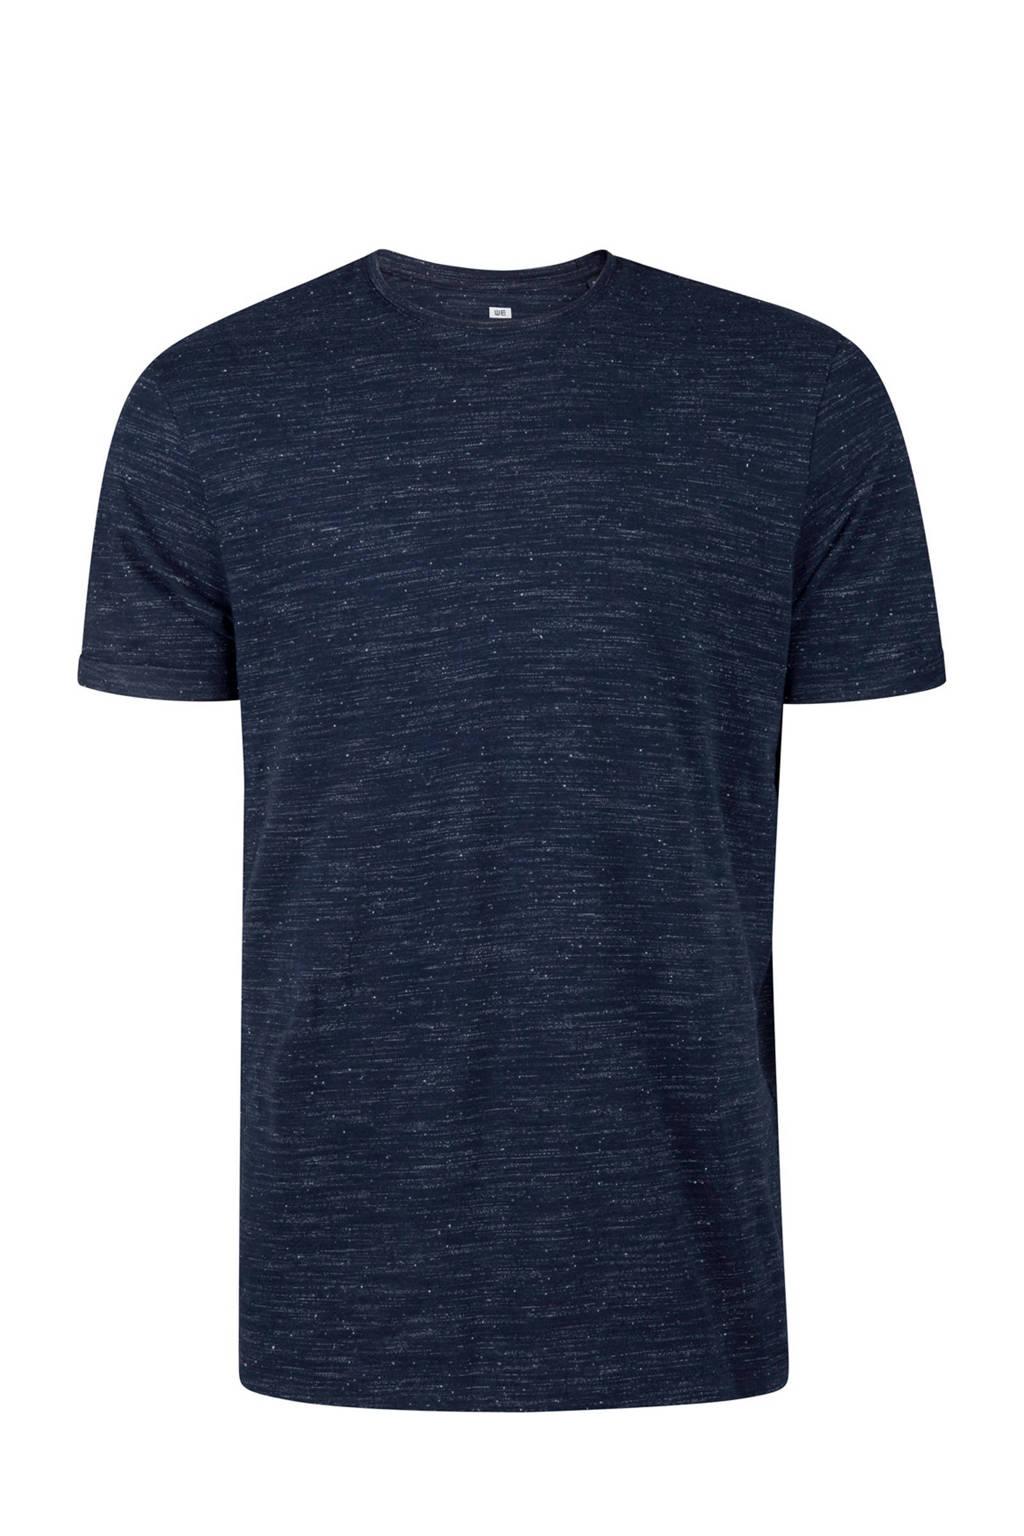 WE Fashion T-shirt, Royal Navy